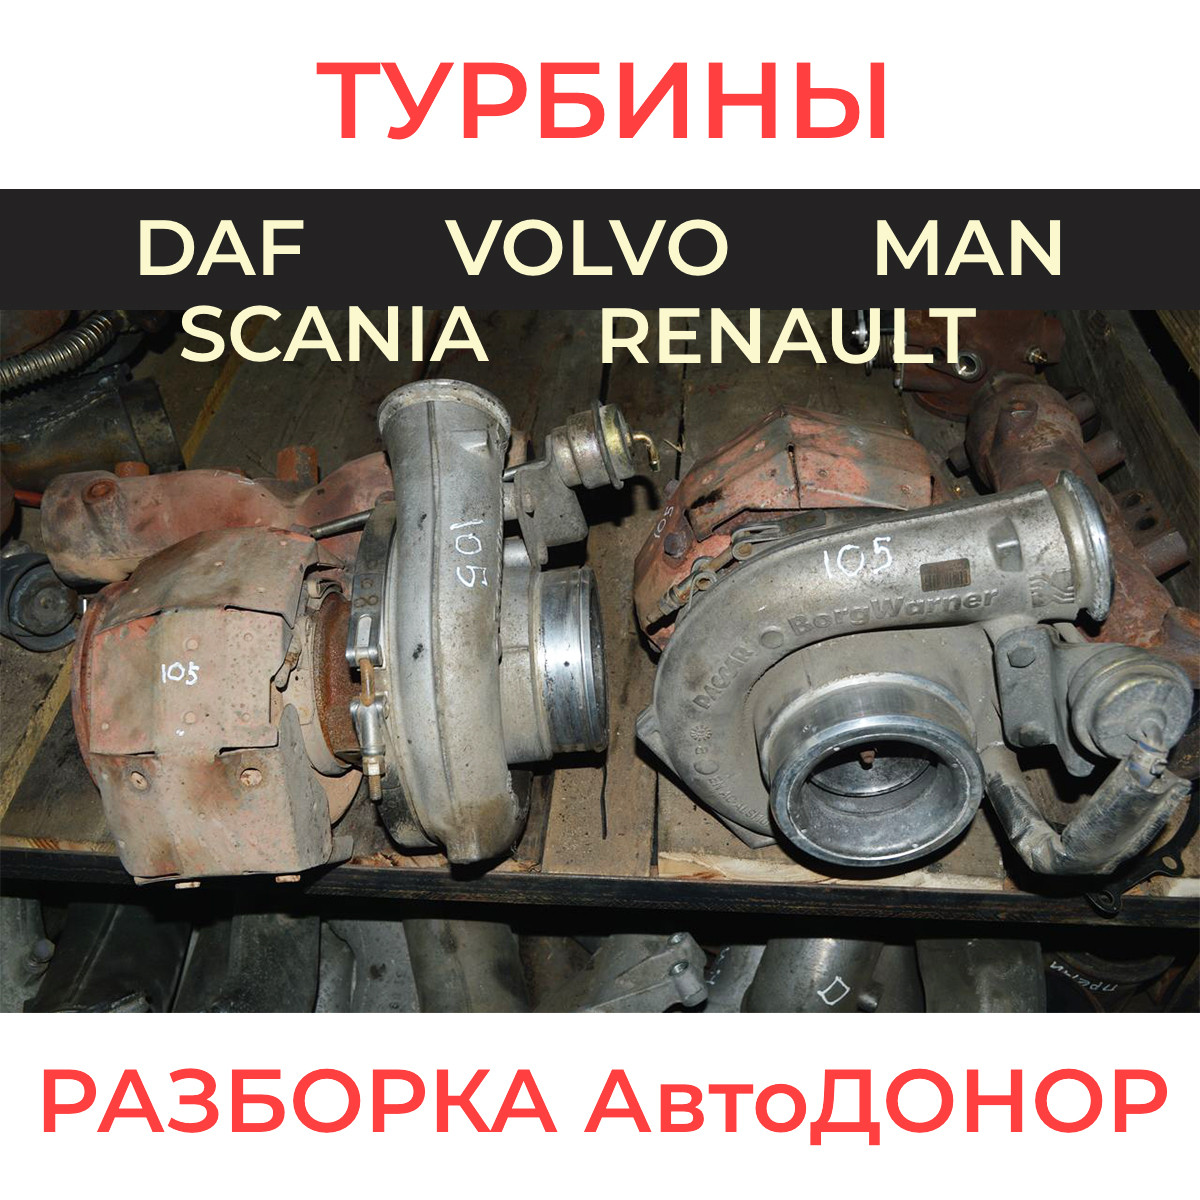 Турбина на тягач DAF, MAN, RENAULT, VOLVO, SCANIA. Разборка АвтоДОНОР